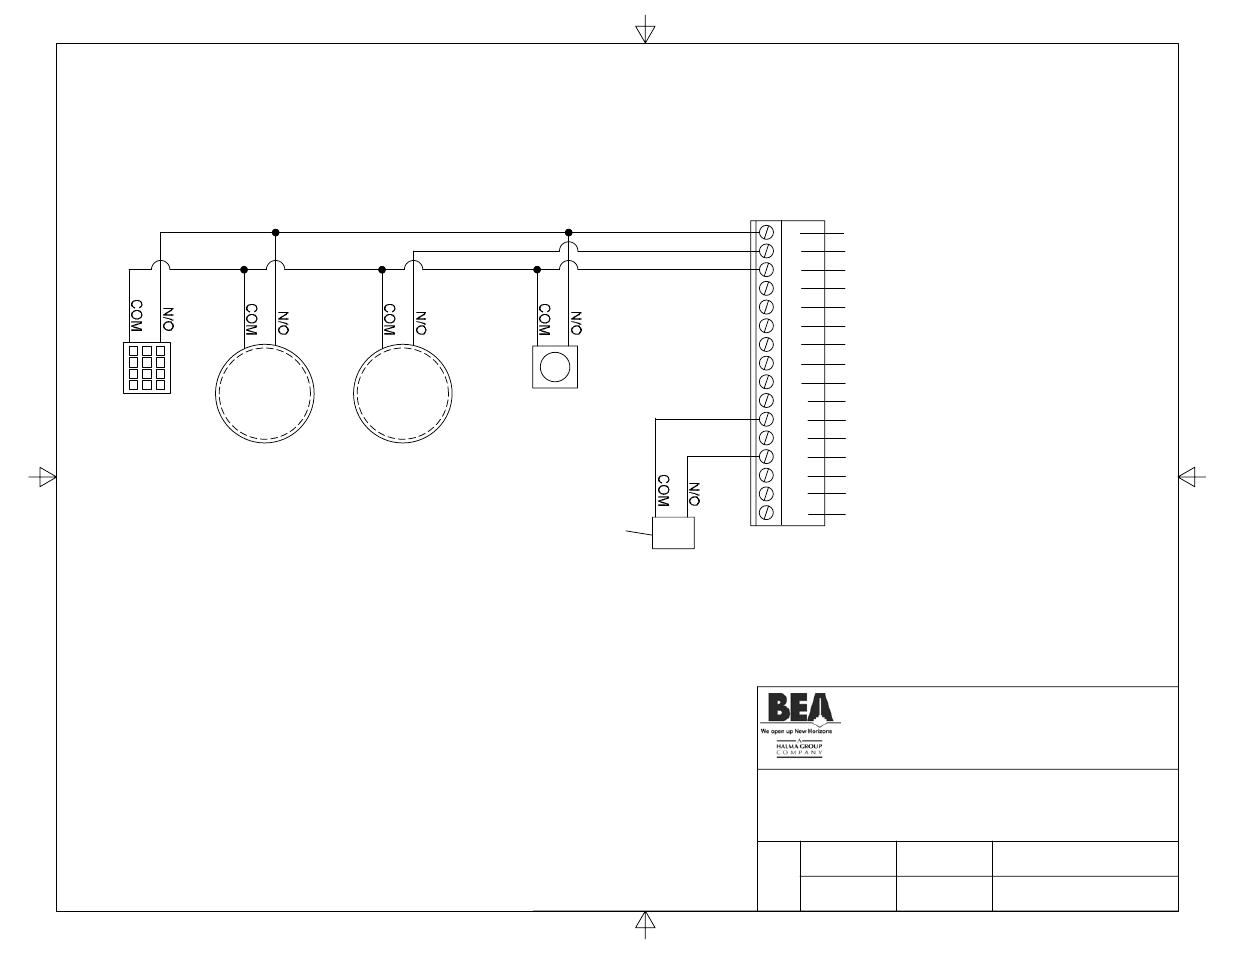 bea horton c2150 user manual page 12 20. Black Bedroom Furniture Sets. Home Design Ideas